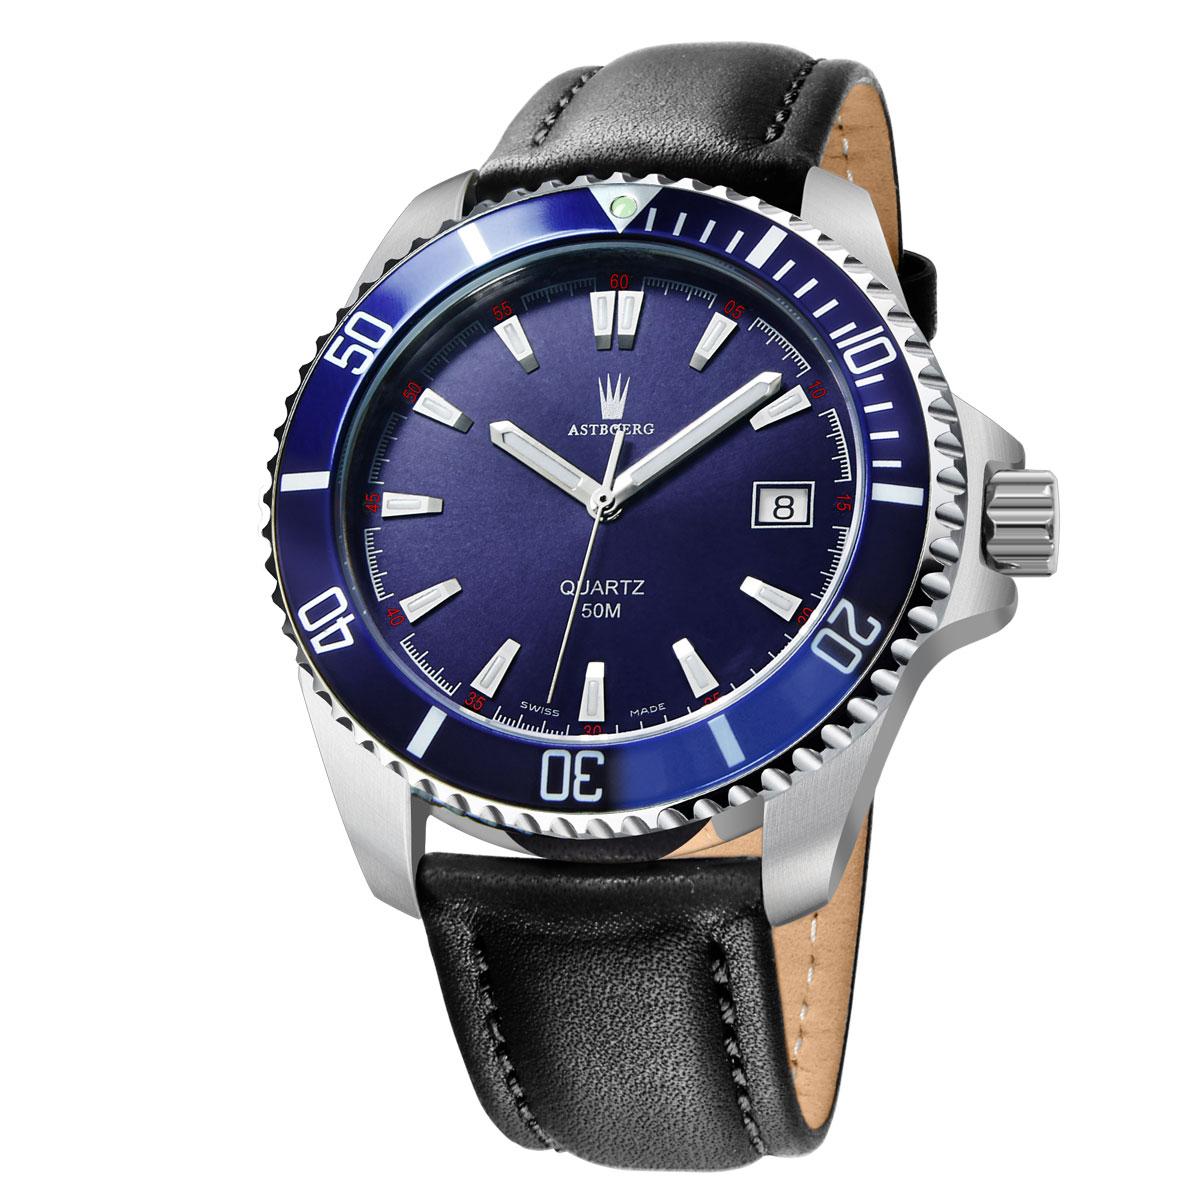 Astboerg Ocean Swiss Made Herrenuhr AT2703LB